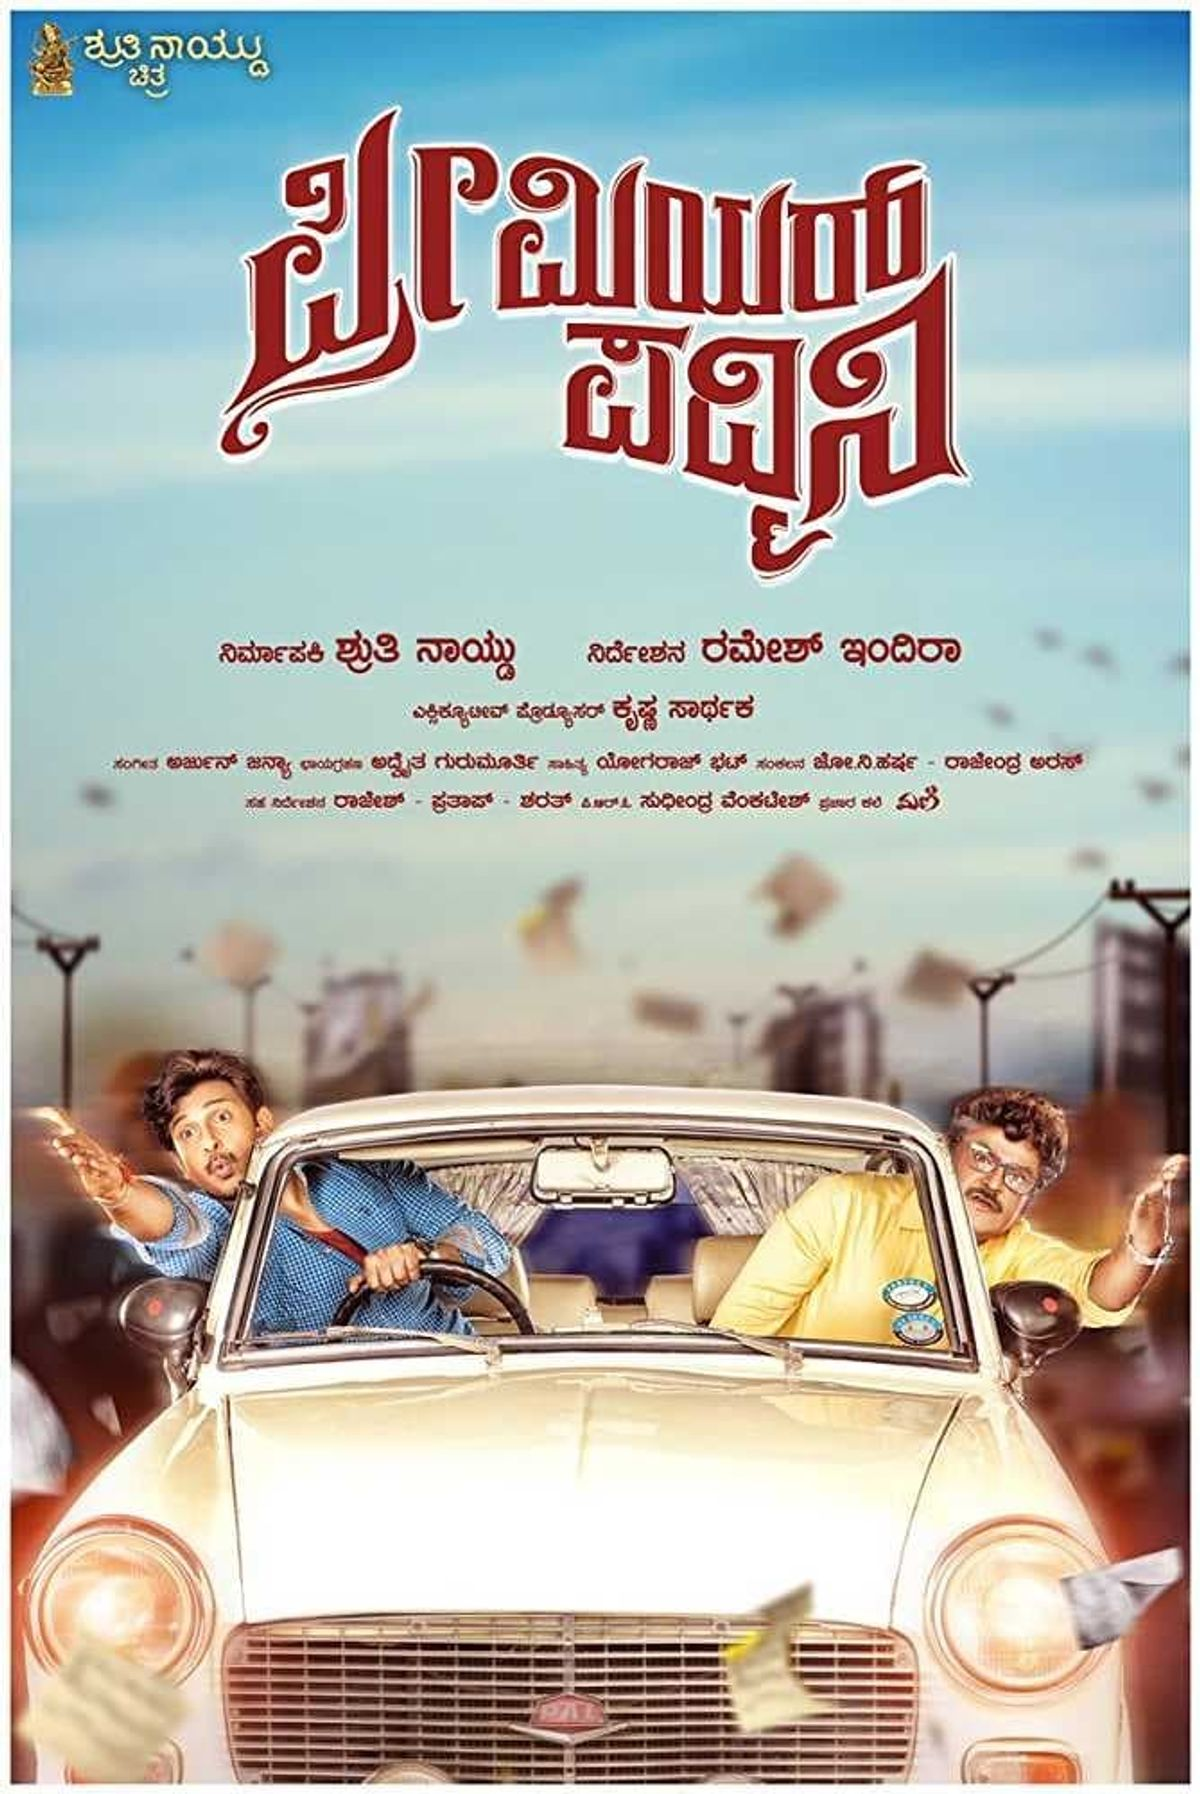 Madhu Bala Best Movies, TV Shows and Web Series List